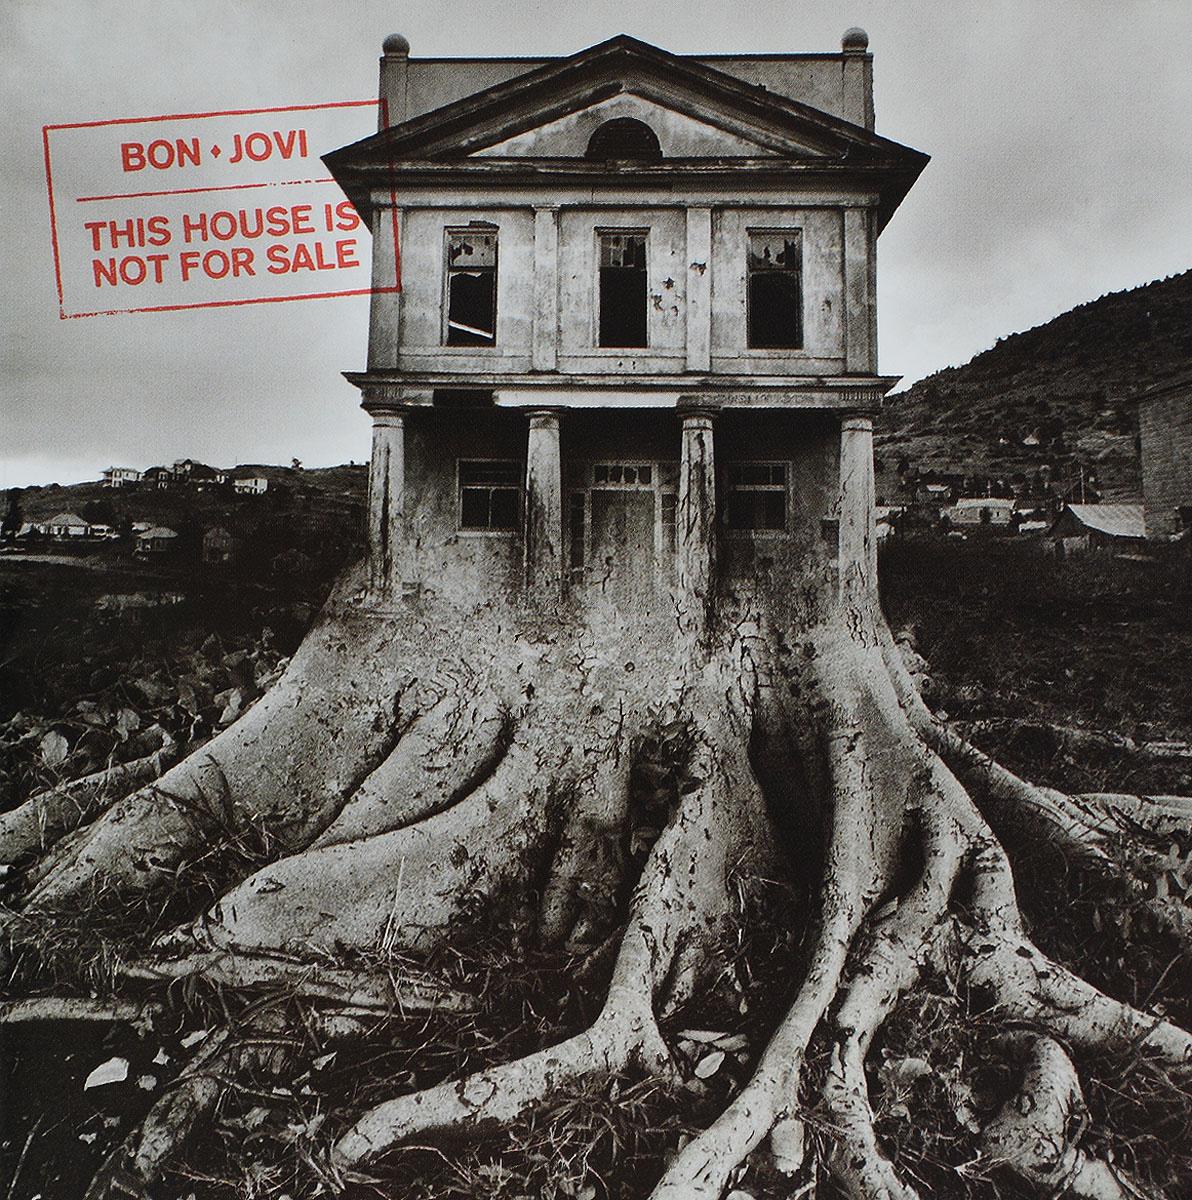 Bon Jovi Jovi. This House Is Not For Sale